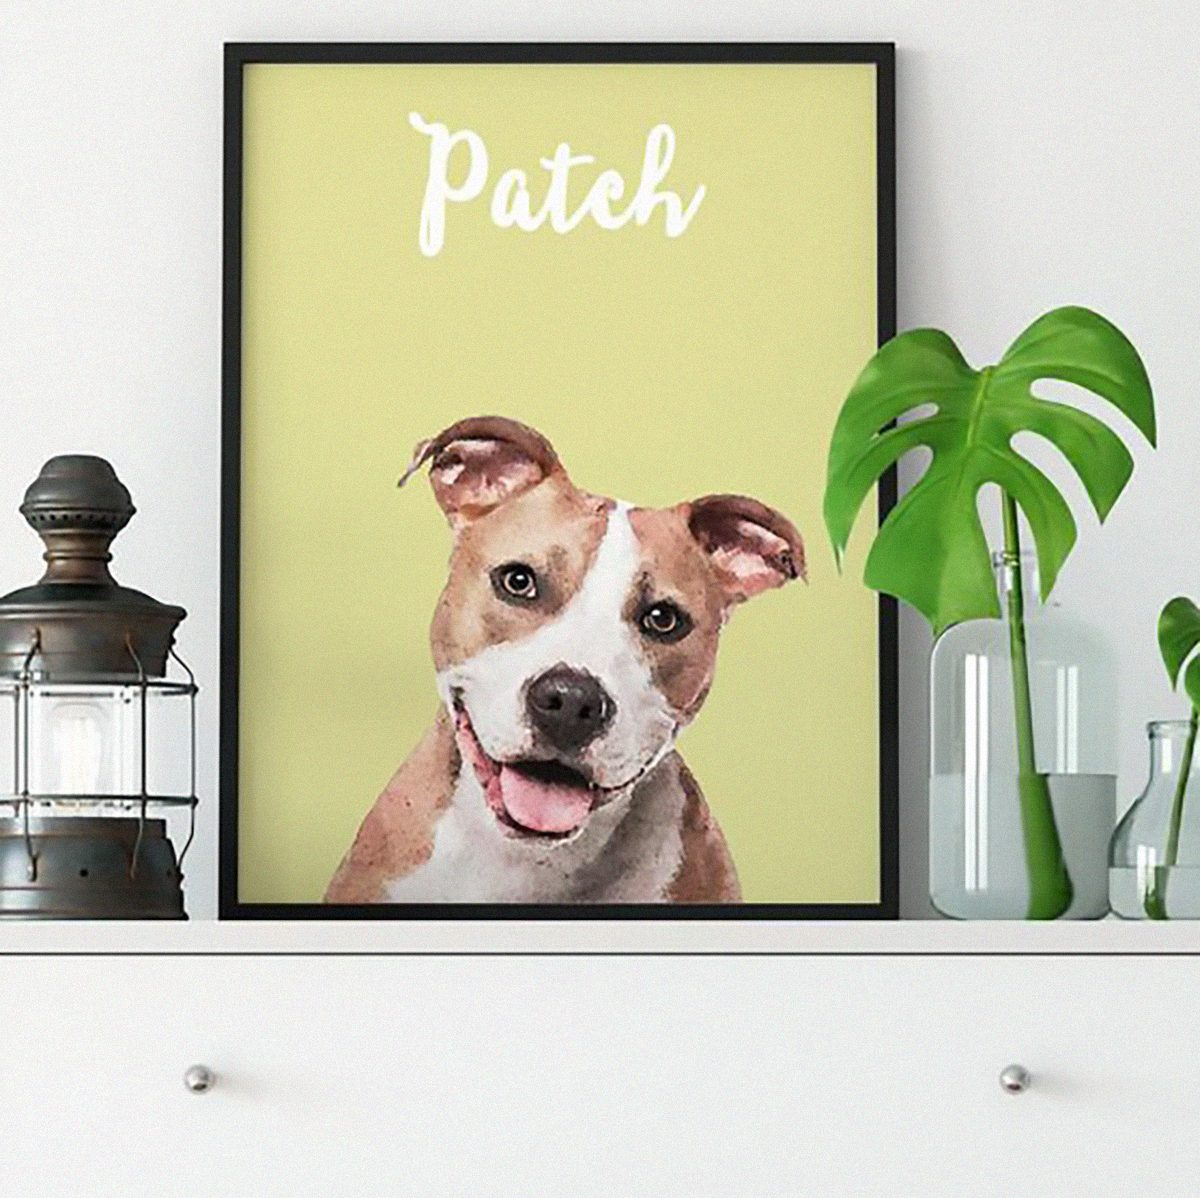 Custom Watercolor Pet Portrait, Pet Portrait, Custom Dog Portrait, Pet Illustration, Pet Art Print, Dog Lover Gift, Christmas Gift